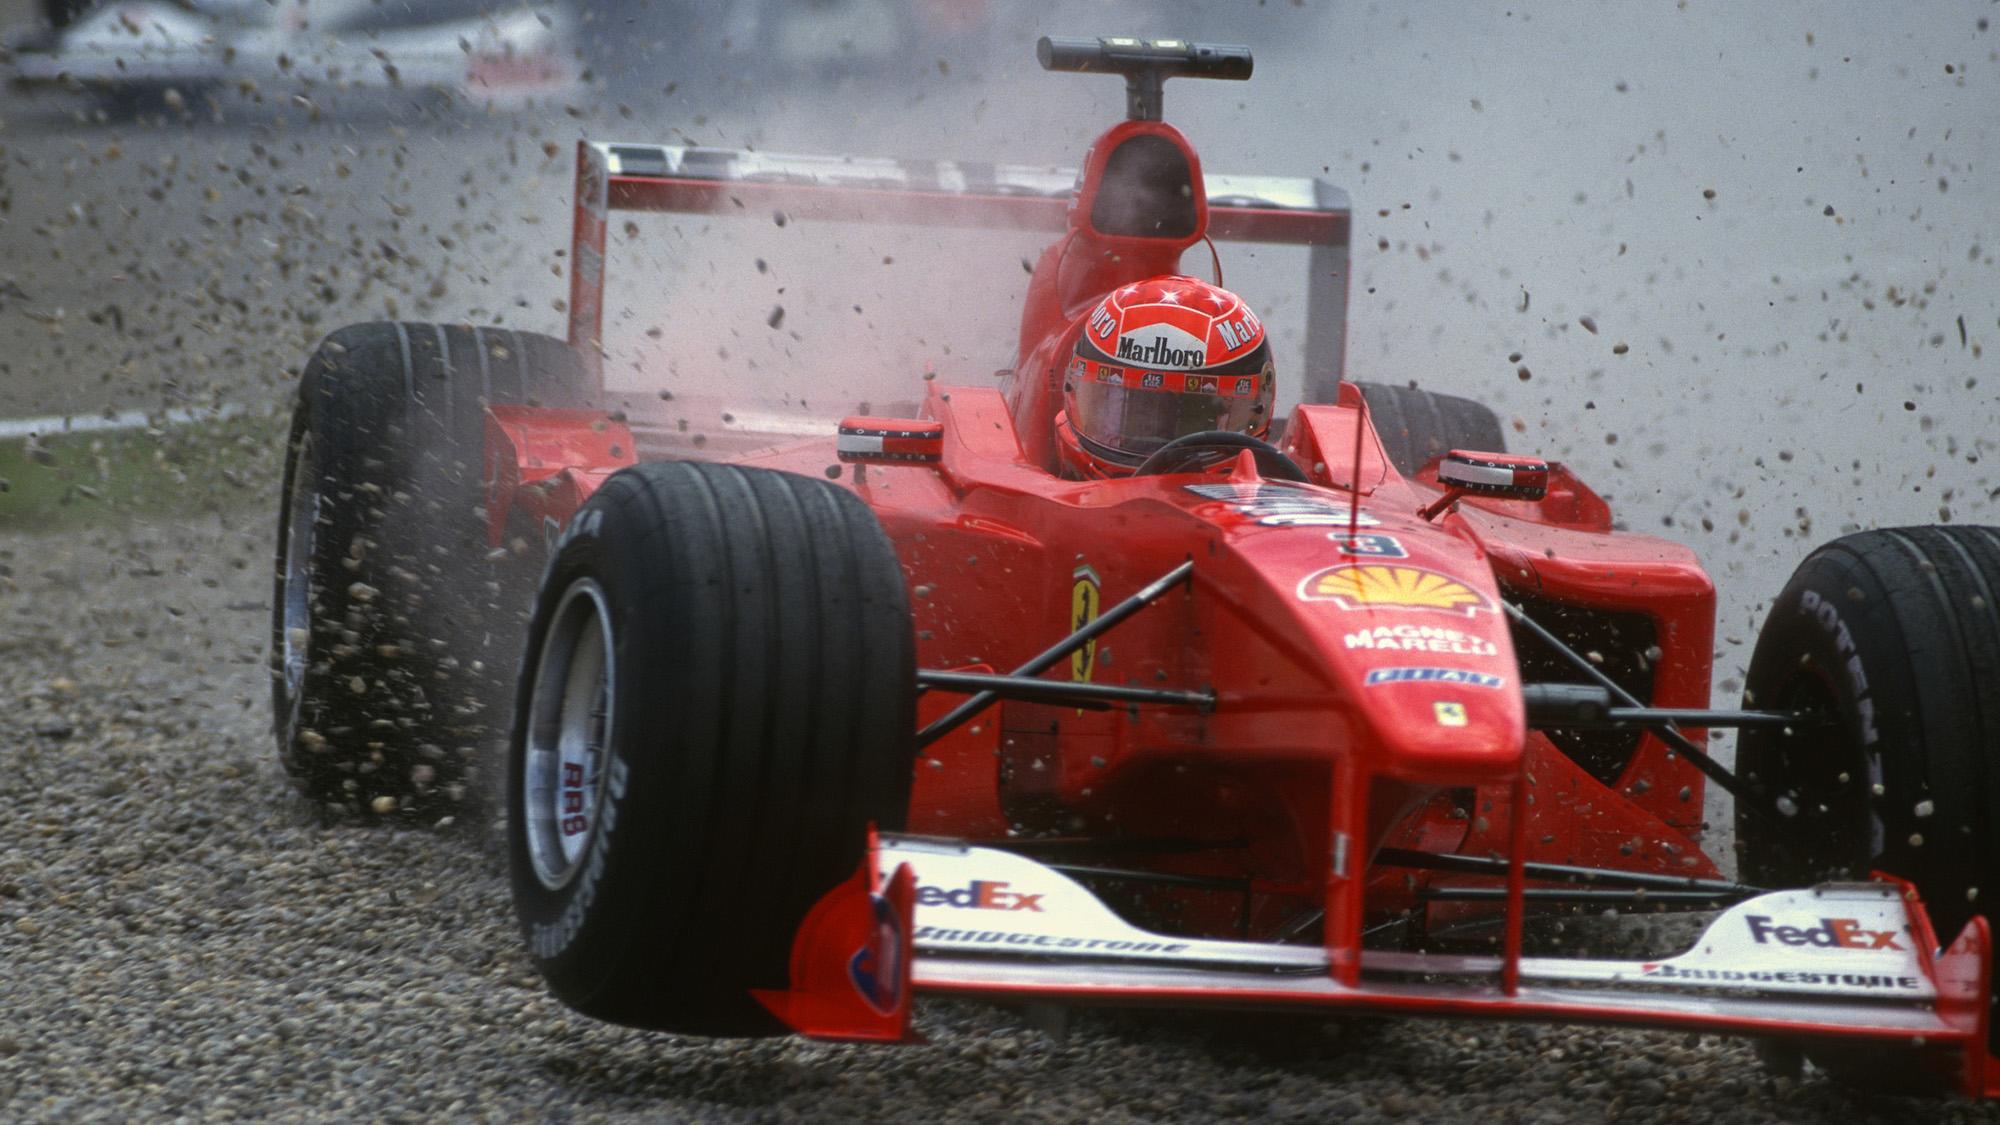 Michael Schumacher crashes at the 2000 German Grand Prix